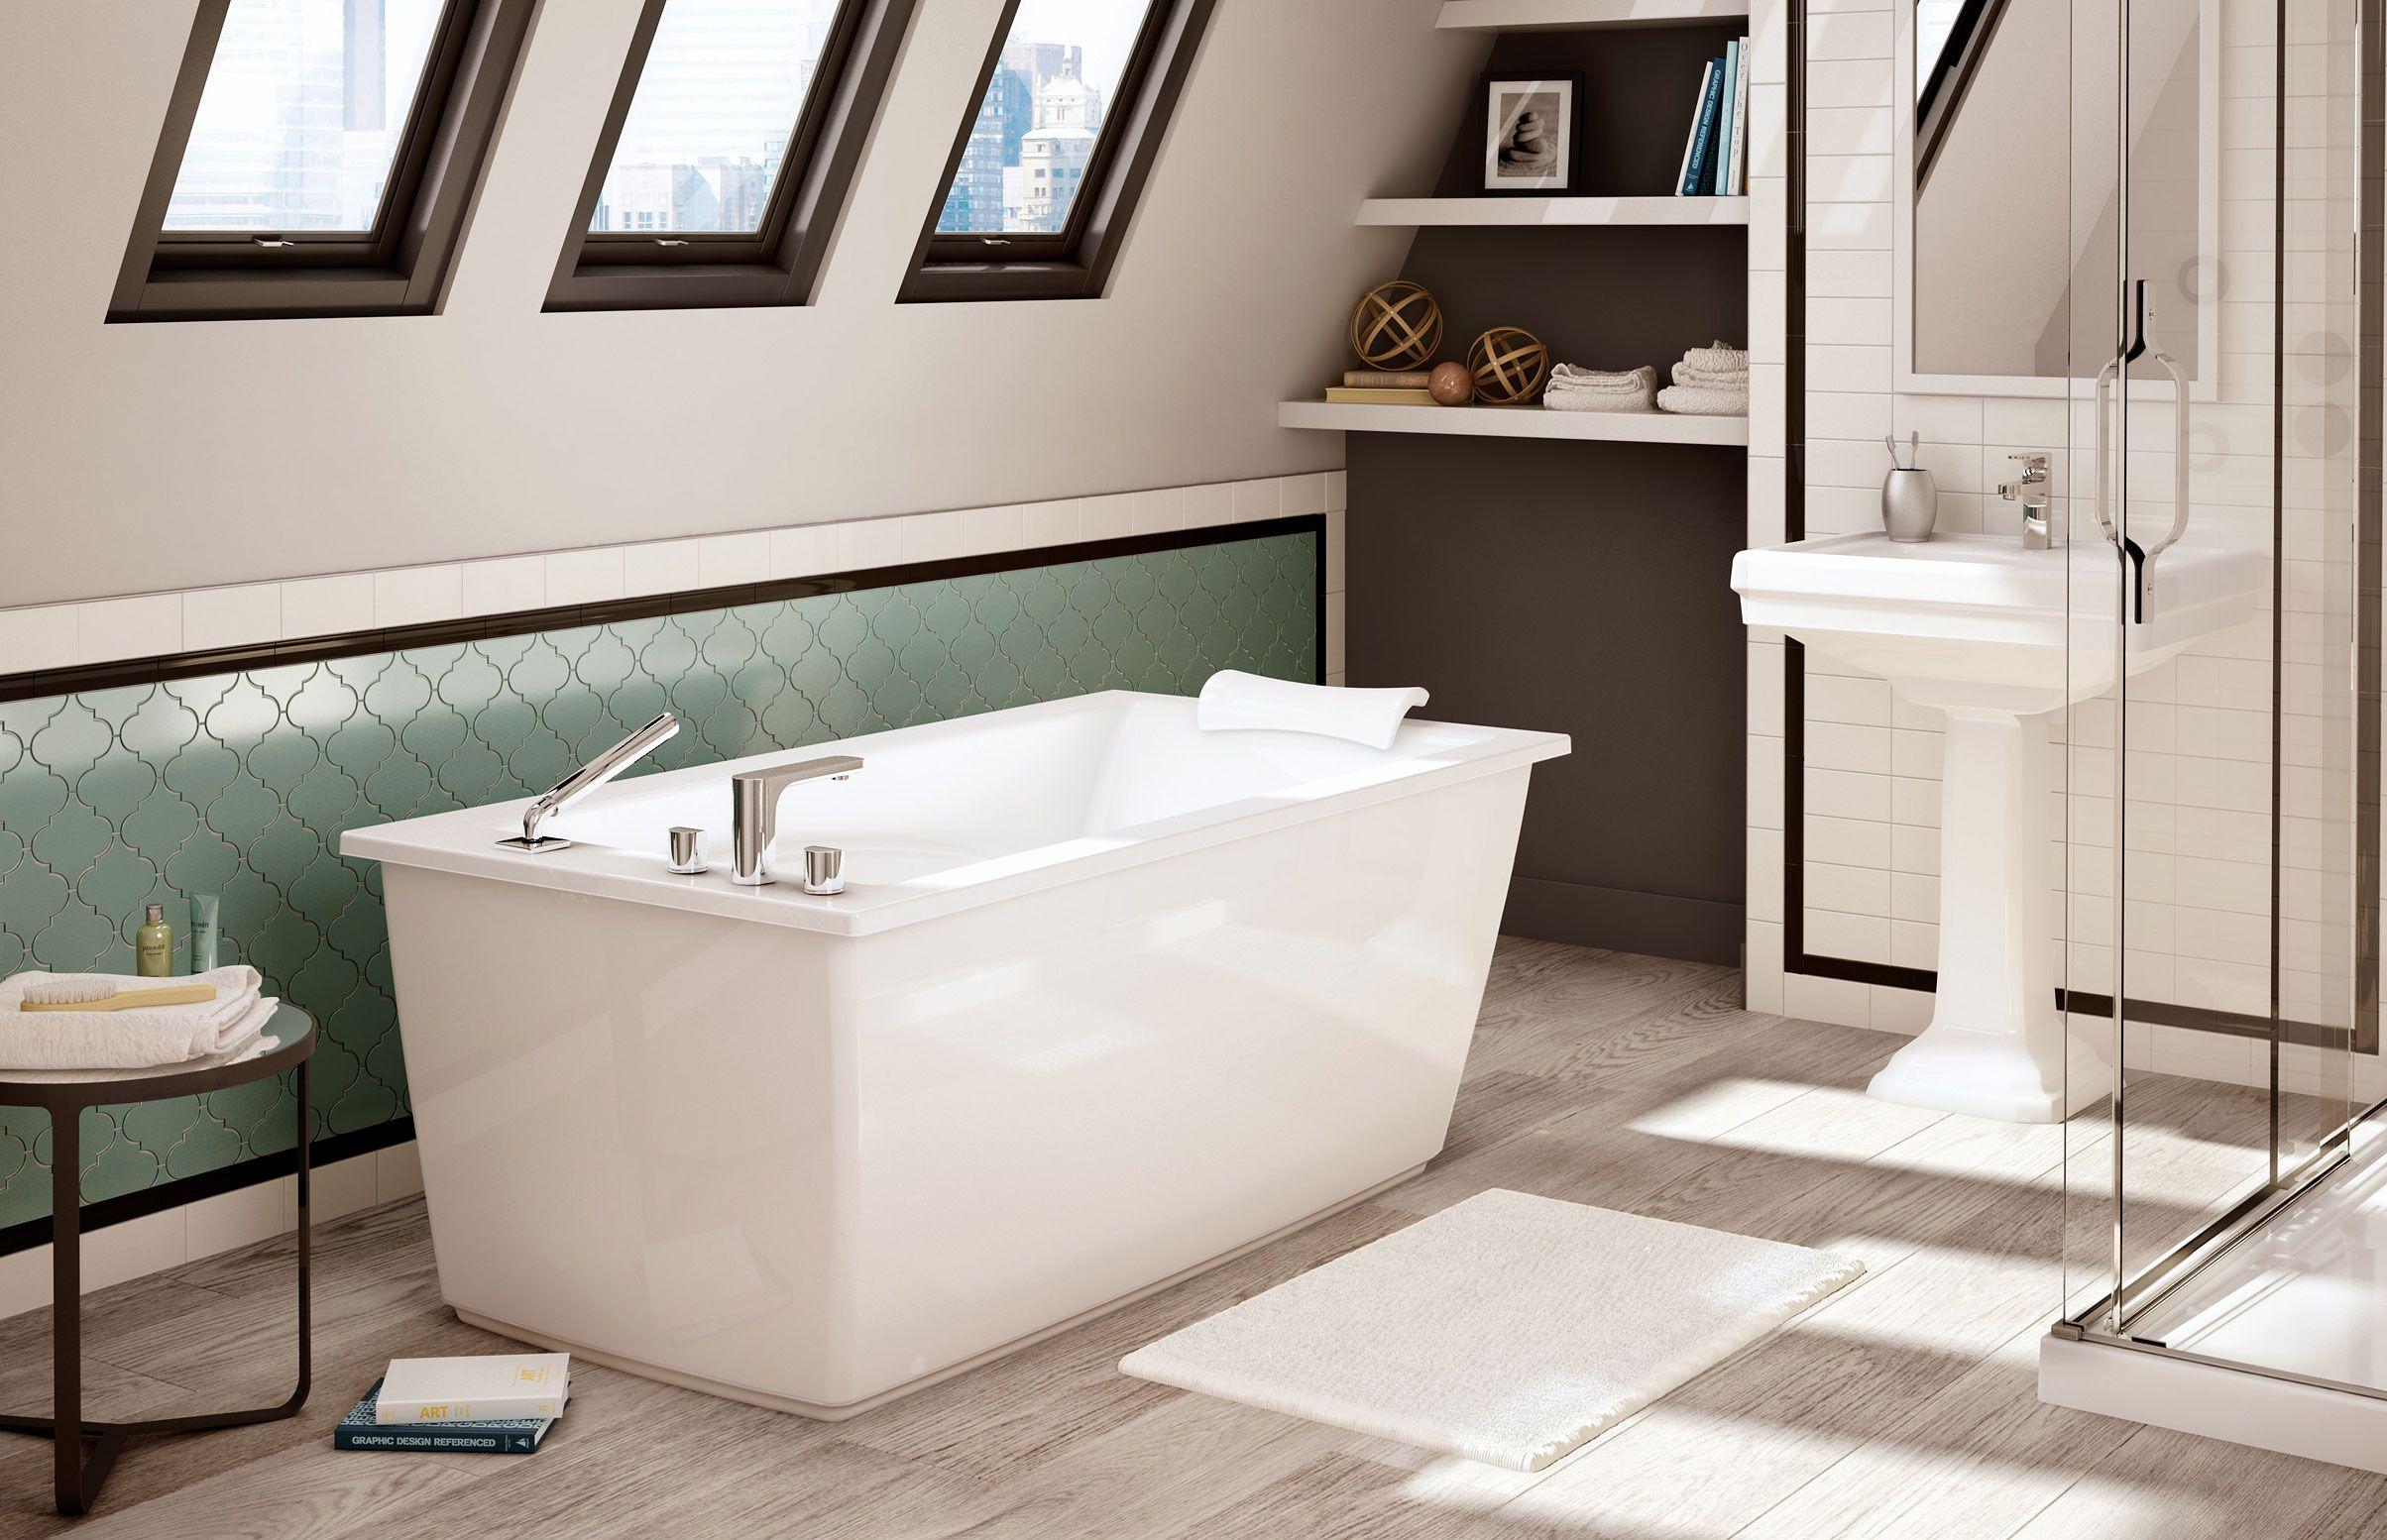 Optik 6032 F | bath | Pinterest | Bathtubs, Bath and Bathtub ideas